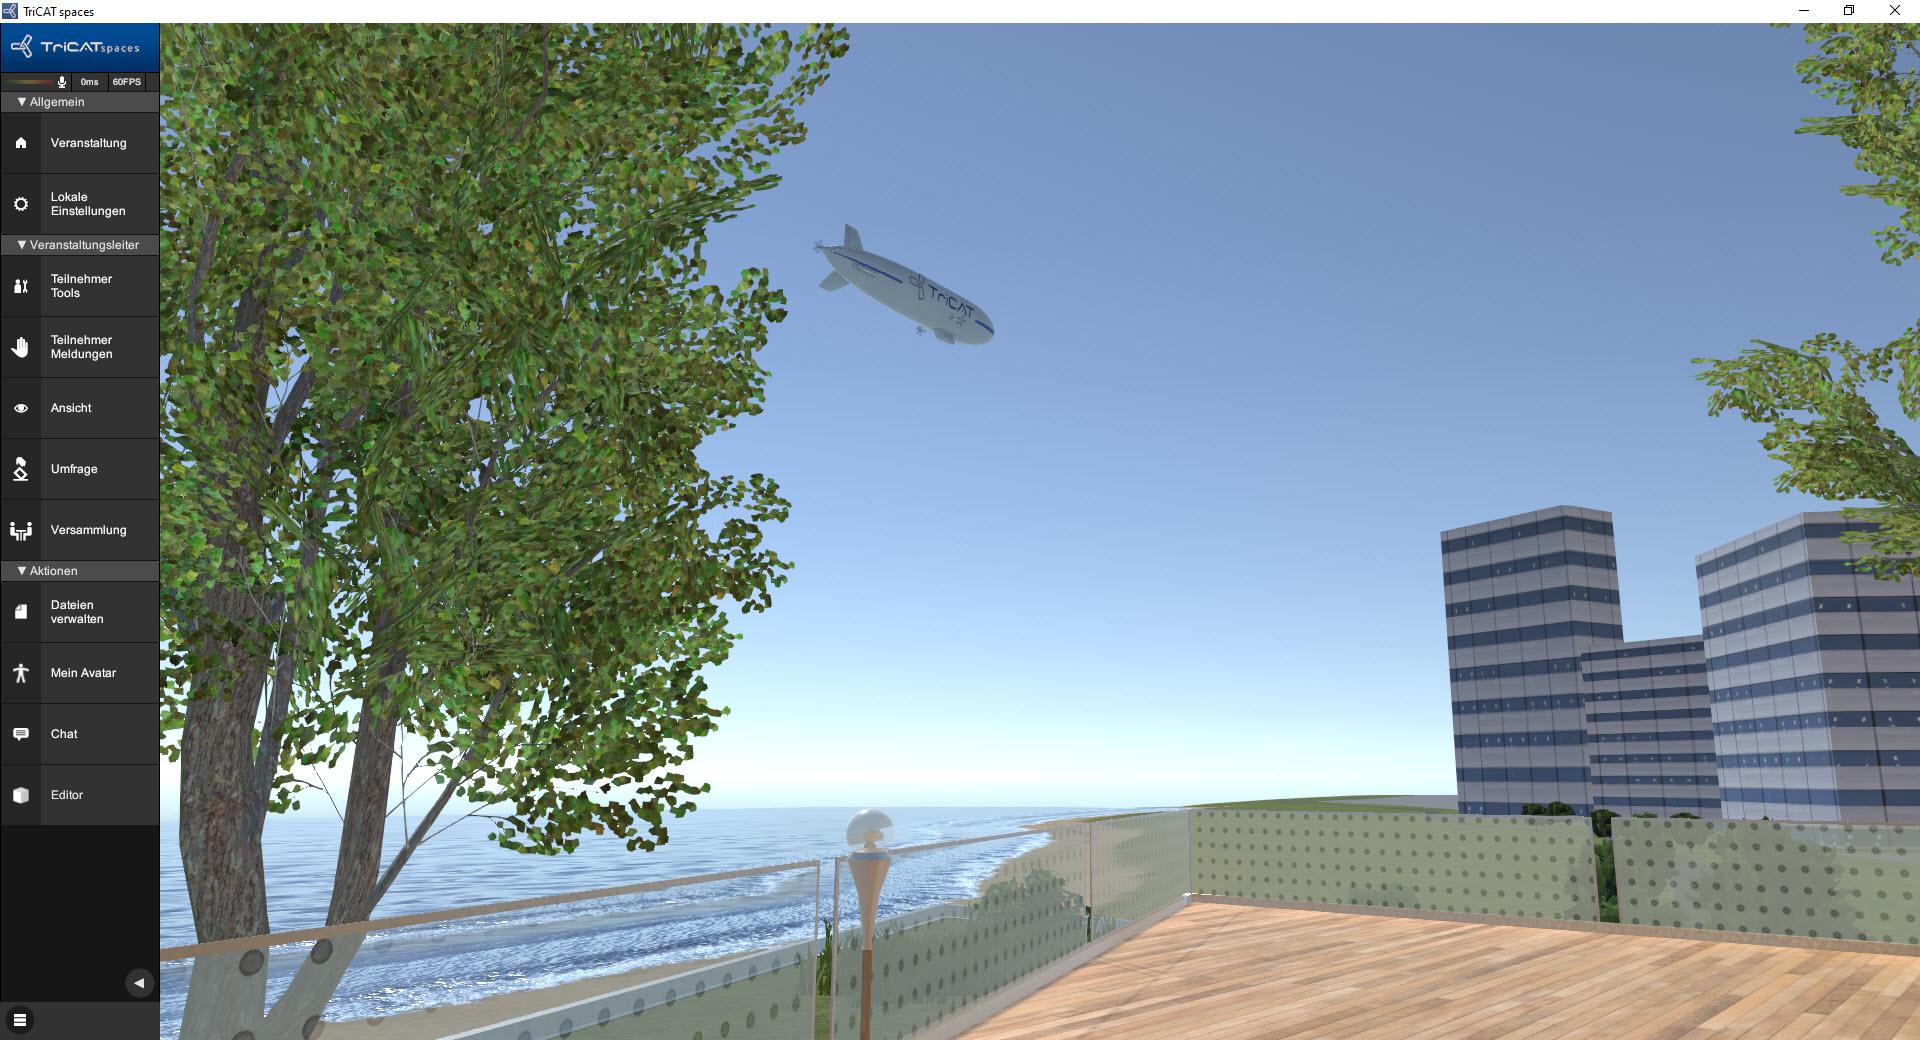 Online-Seminare in der virtuellen 3D Lernumgebung der TriCAT Zeppelin